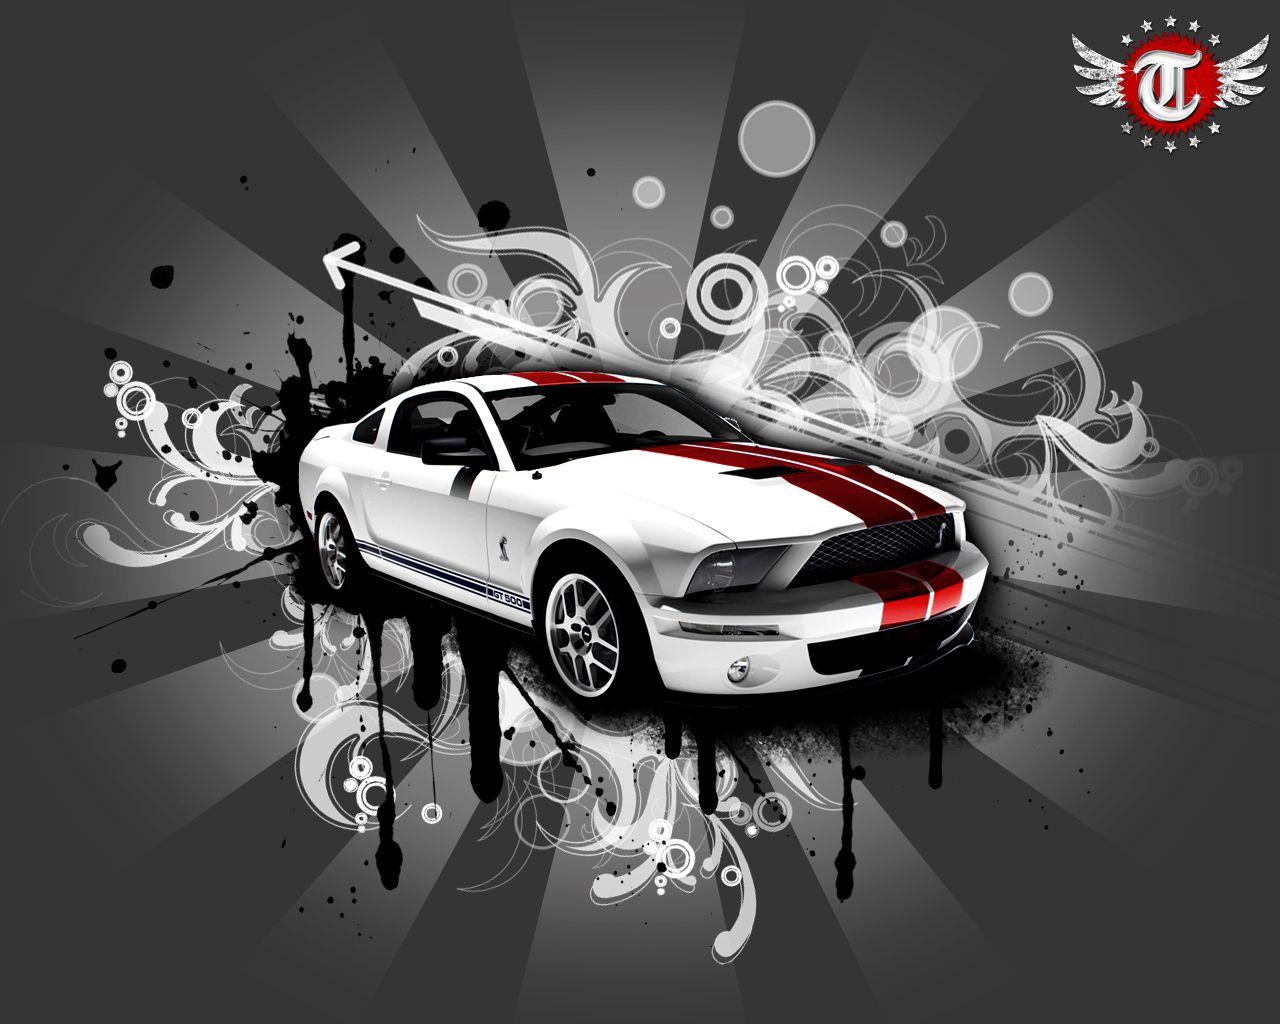 http://2.bp.blogspot.com/-Aype2O9342Y/UD7mpZPUe0I/AAAAAAAAN_k/KhlOJ849bjQ/s1600/carro-tunning-wallpaper-papeis_de_parede_de_carros-.jpg